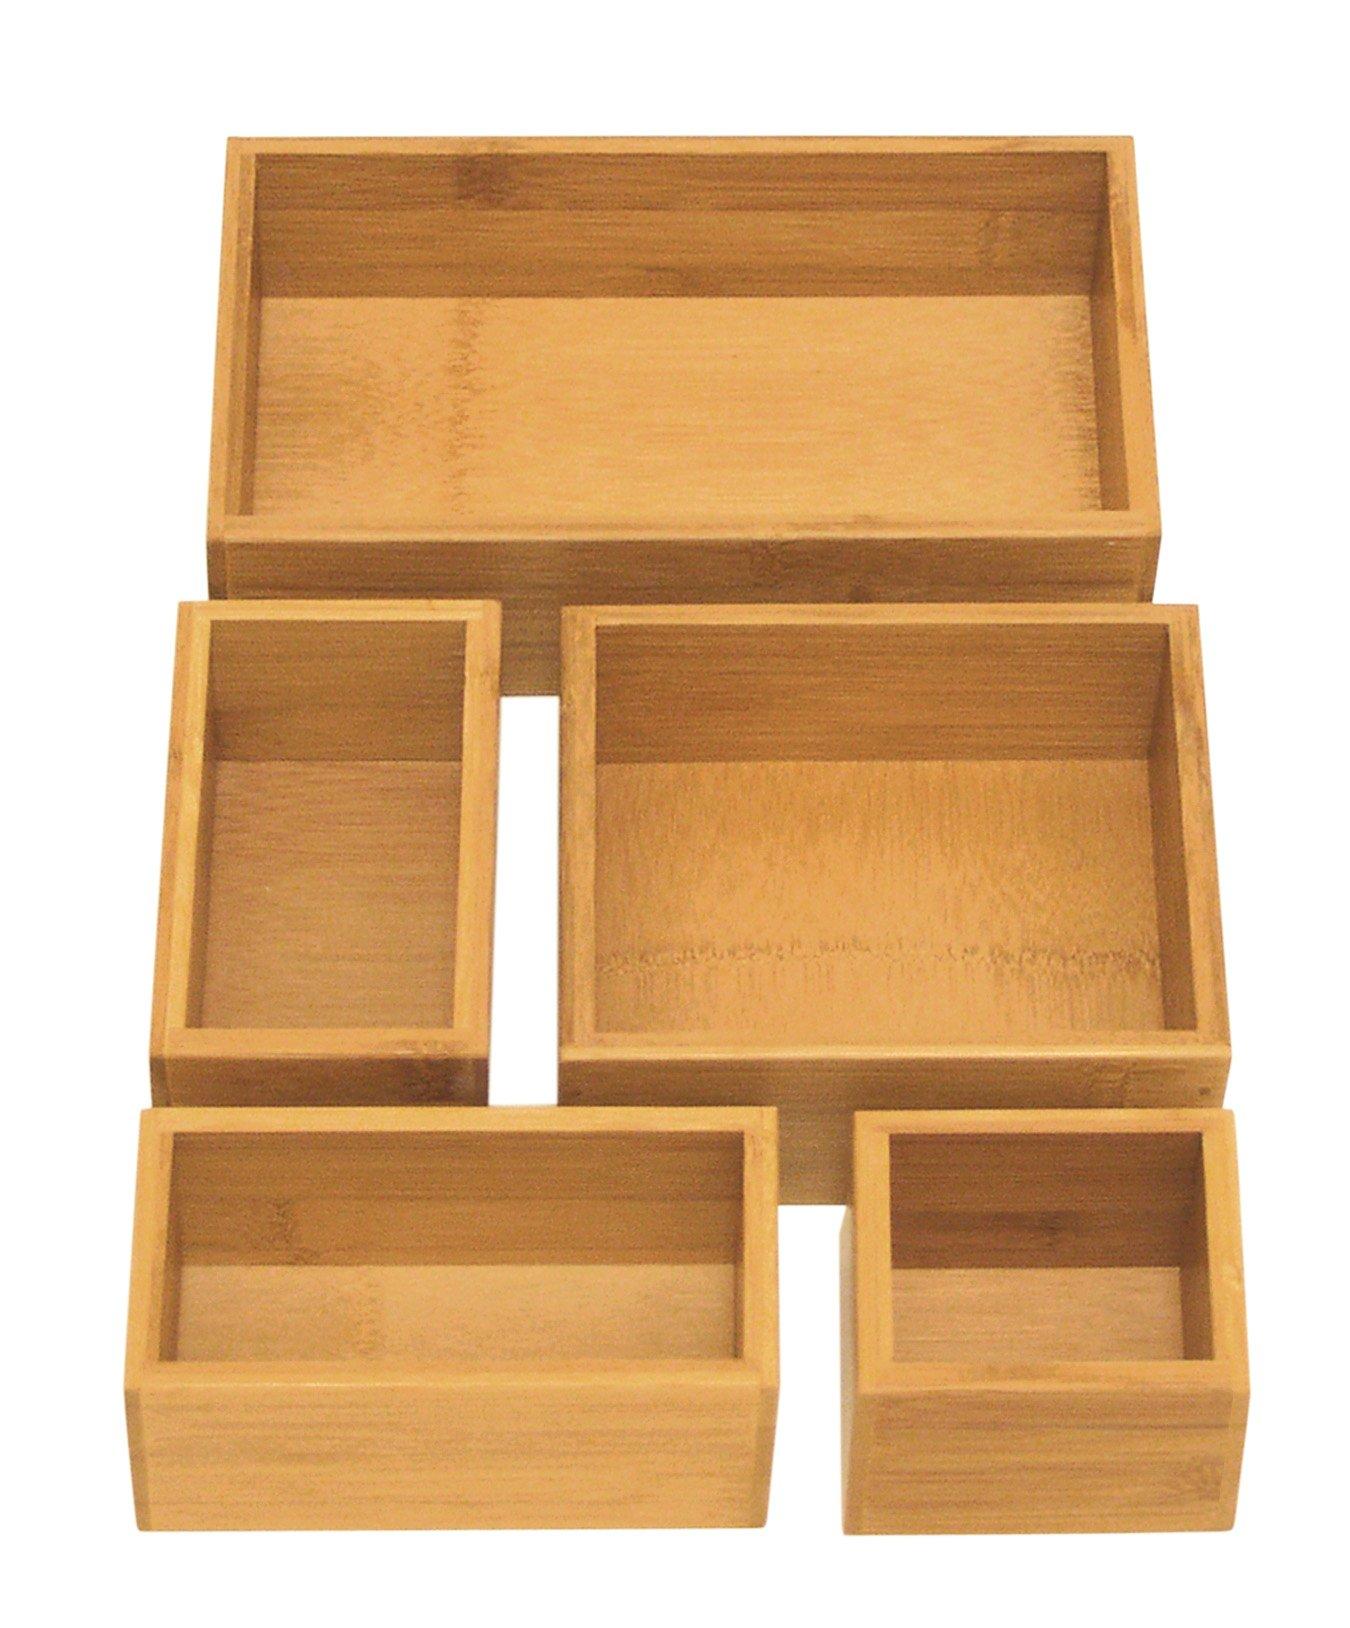 Seville Classics 5-Piece Bamboo Storage Box Set, 18x10 by Seville Classics